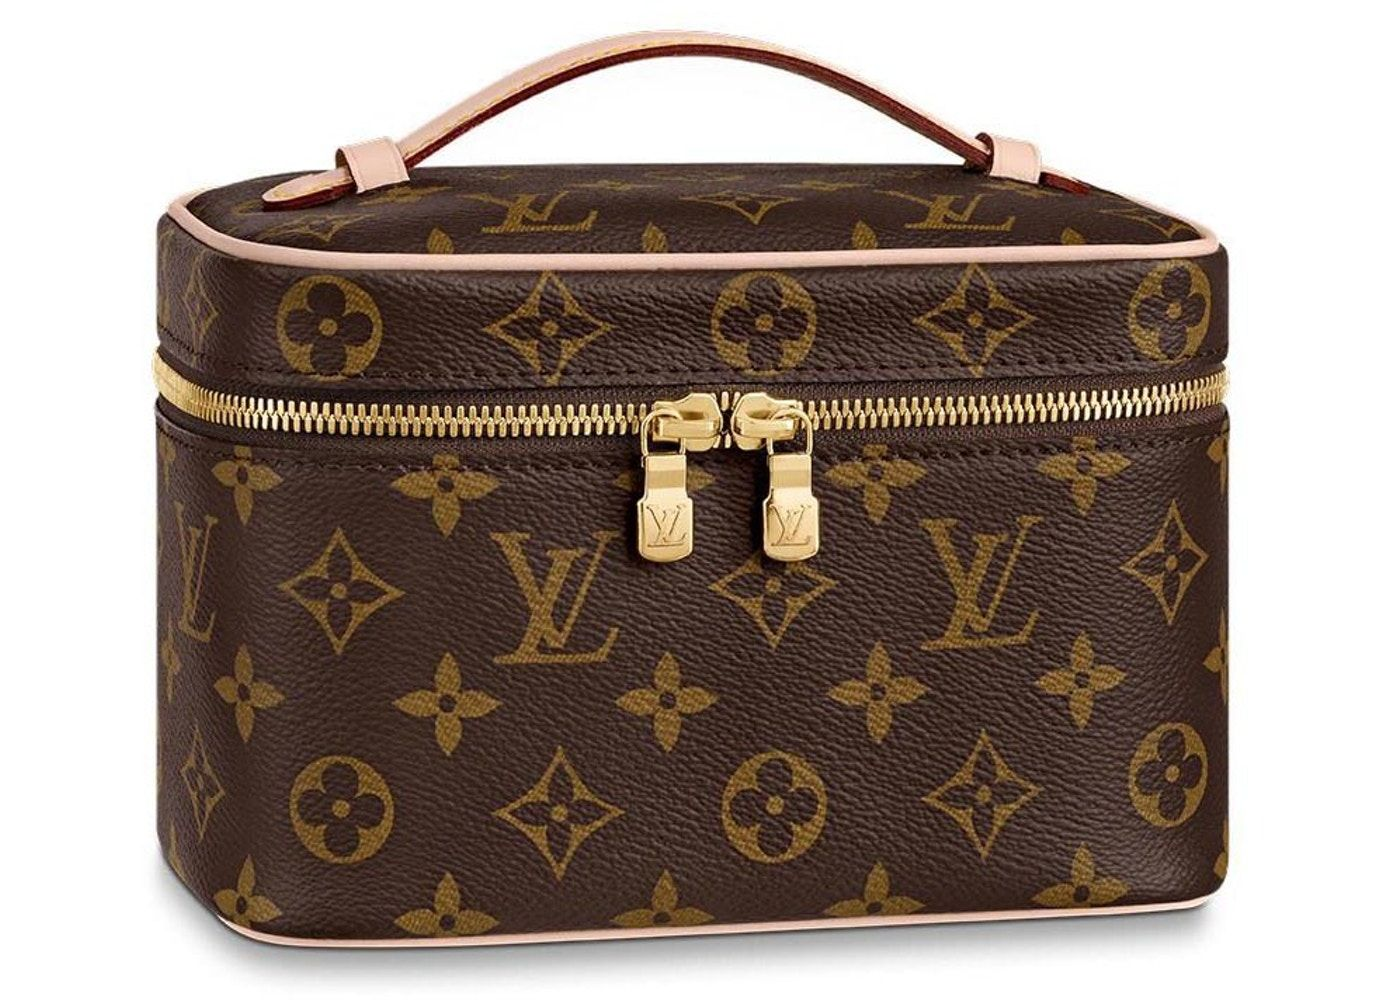 Louis Vuitton Nice Beauty Case Monogram Mini Brown In 2020 Louis Vuitton Louis Vuitton Watches Louis Vuitton Handbags